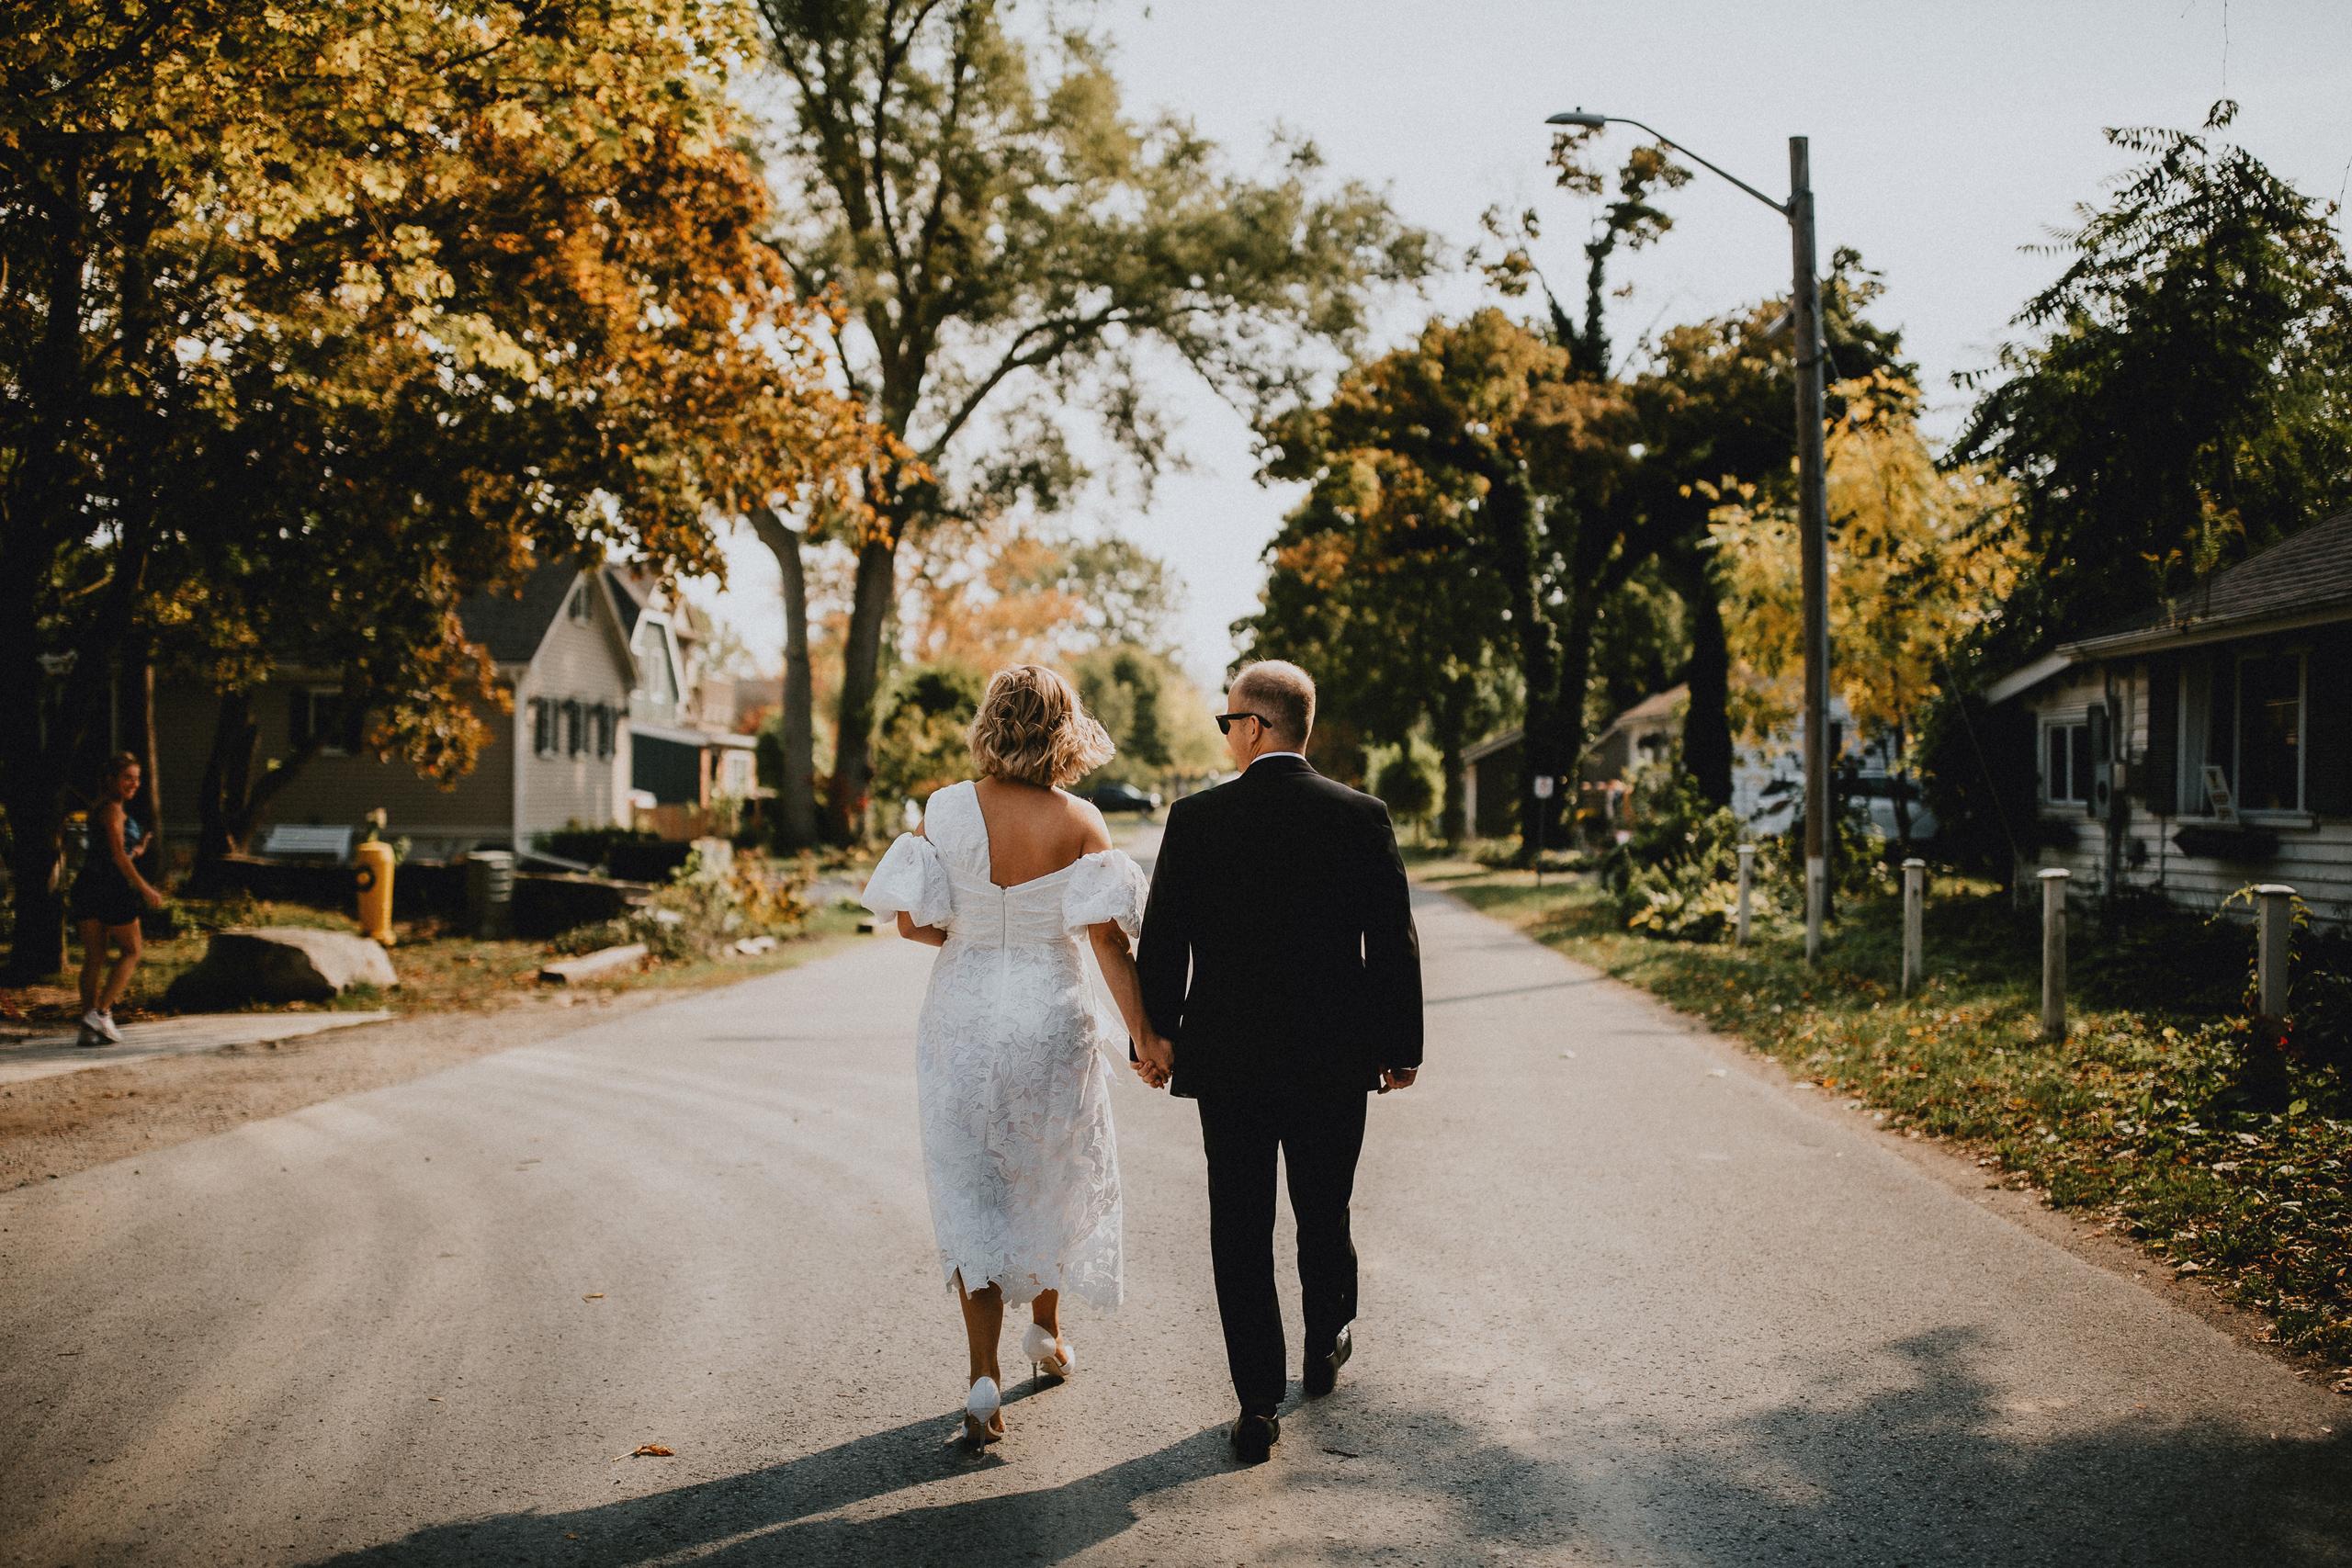 fall wedding niagara on the lake old town photography